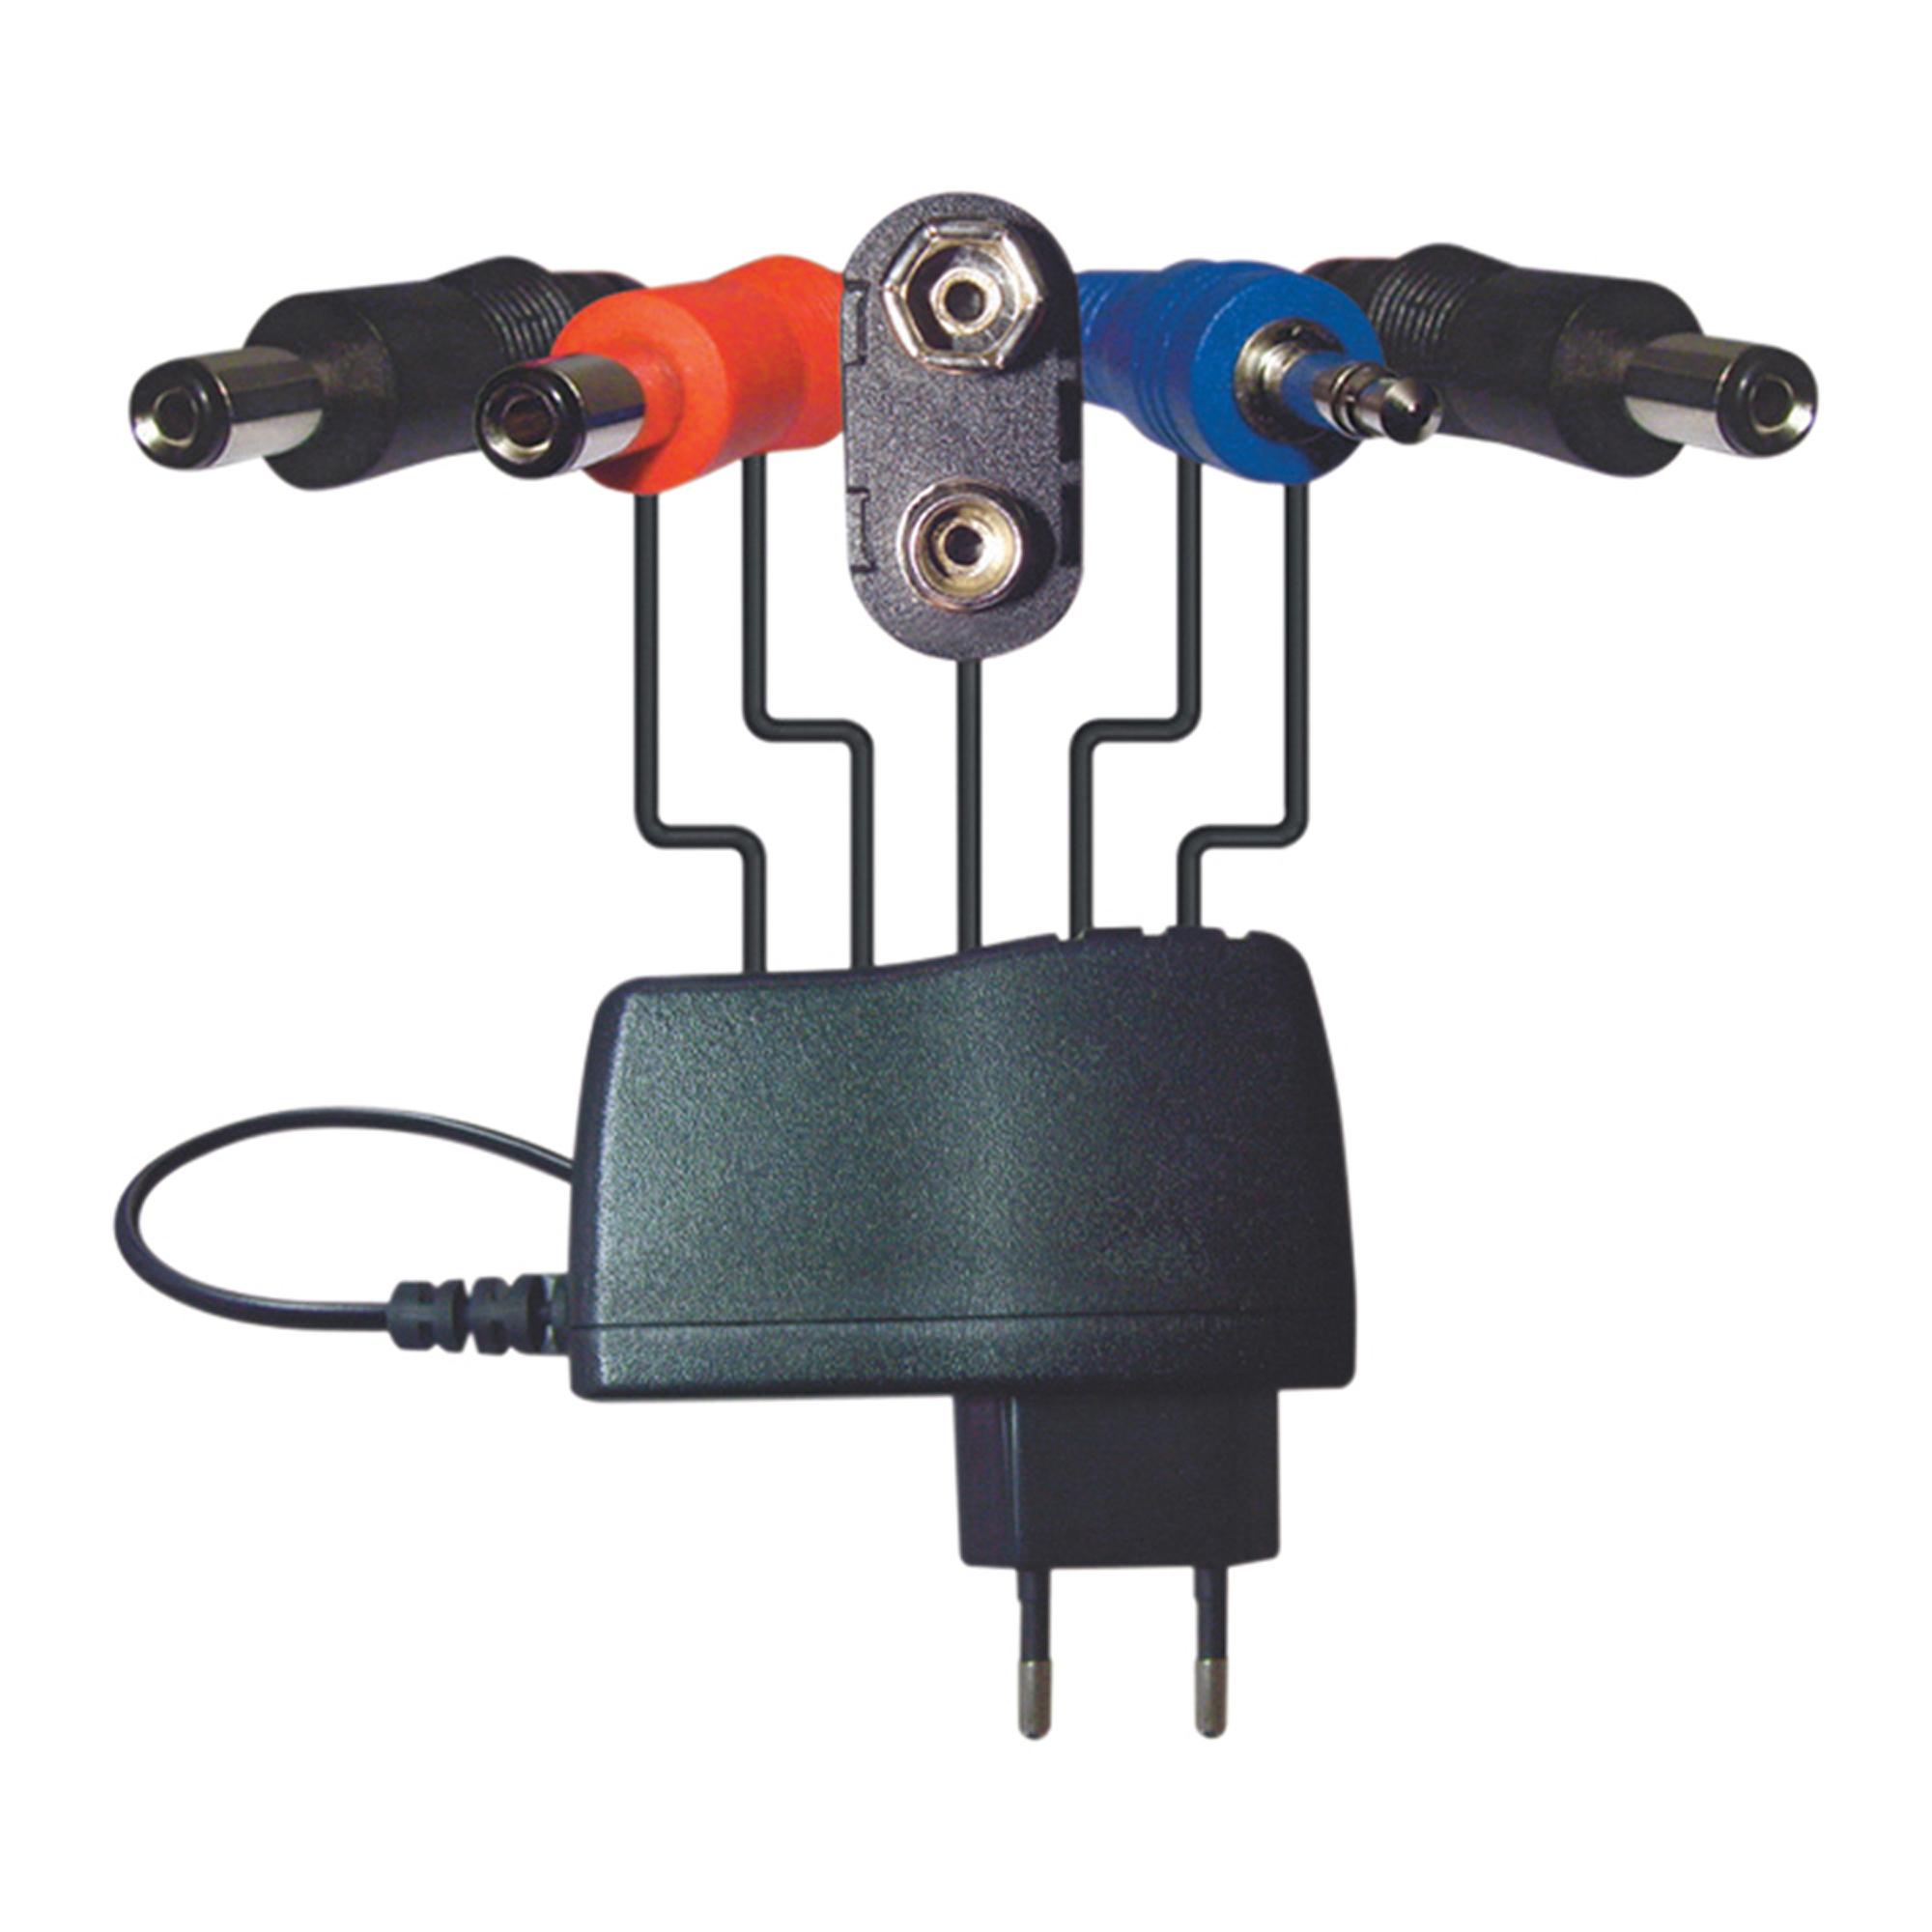 behringer psu hsb all multi foot pedal power supply. Black Bedroom Furniture Sets. Home Design Ideas